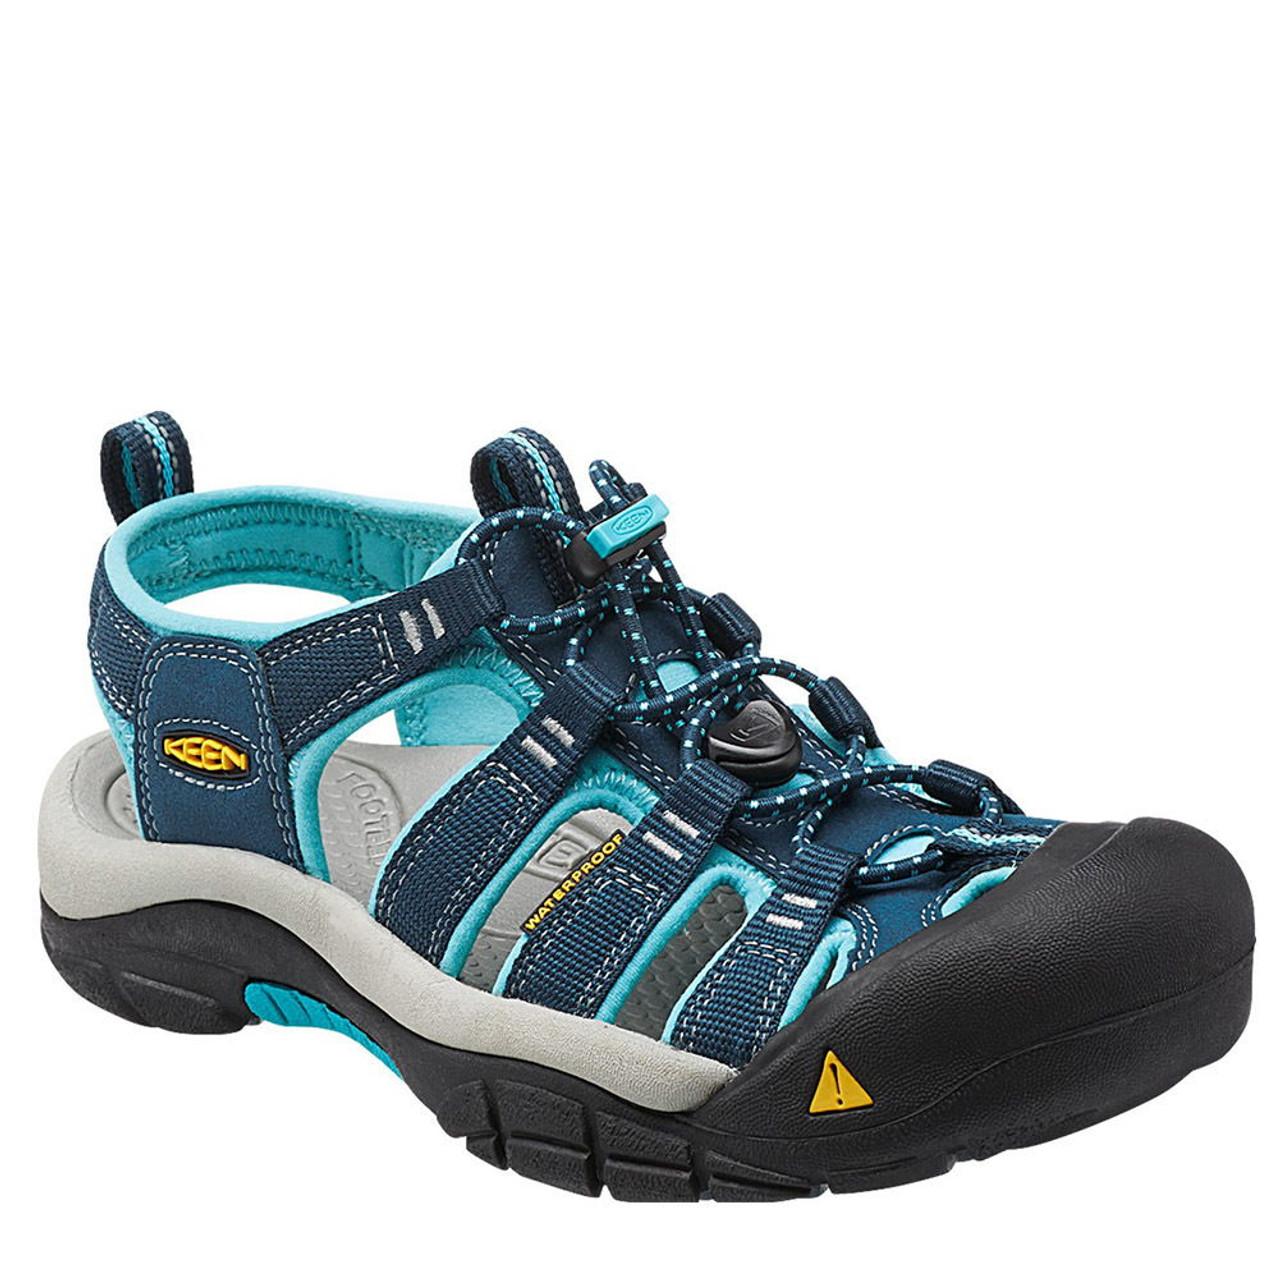 e8bee7461286 Keen Women s Newport H2 Water Sandal Poseidon Capri - Family Footwear Center